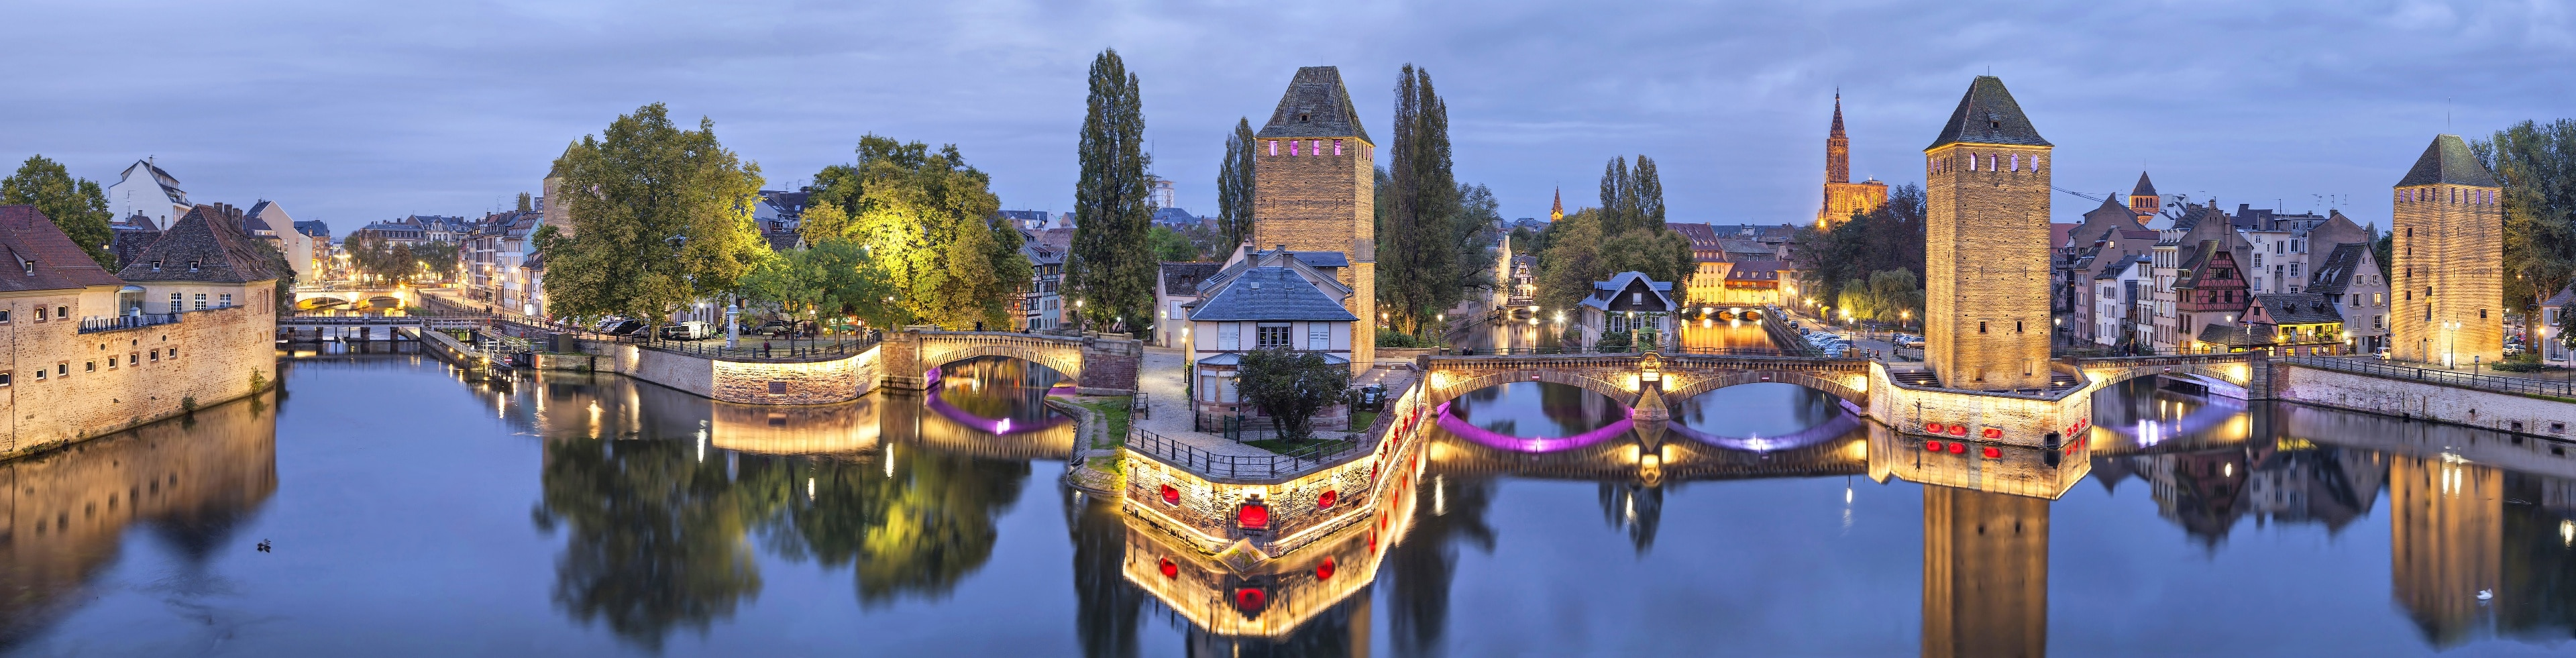 Selestat, Bas-Rhin, France